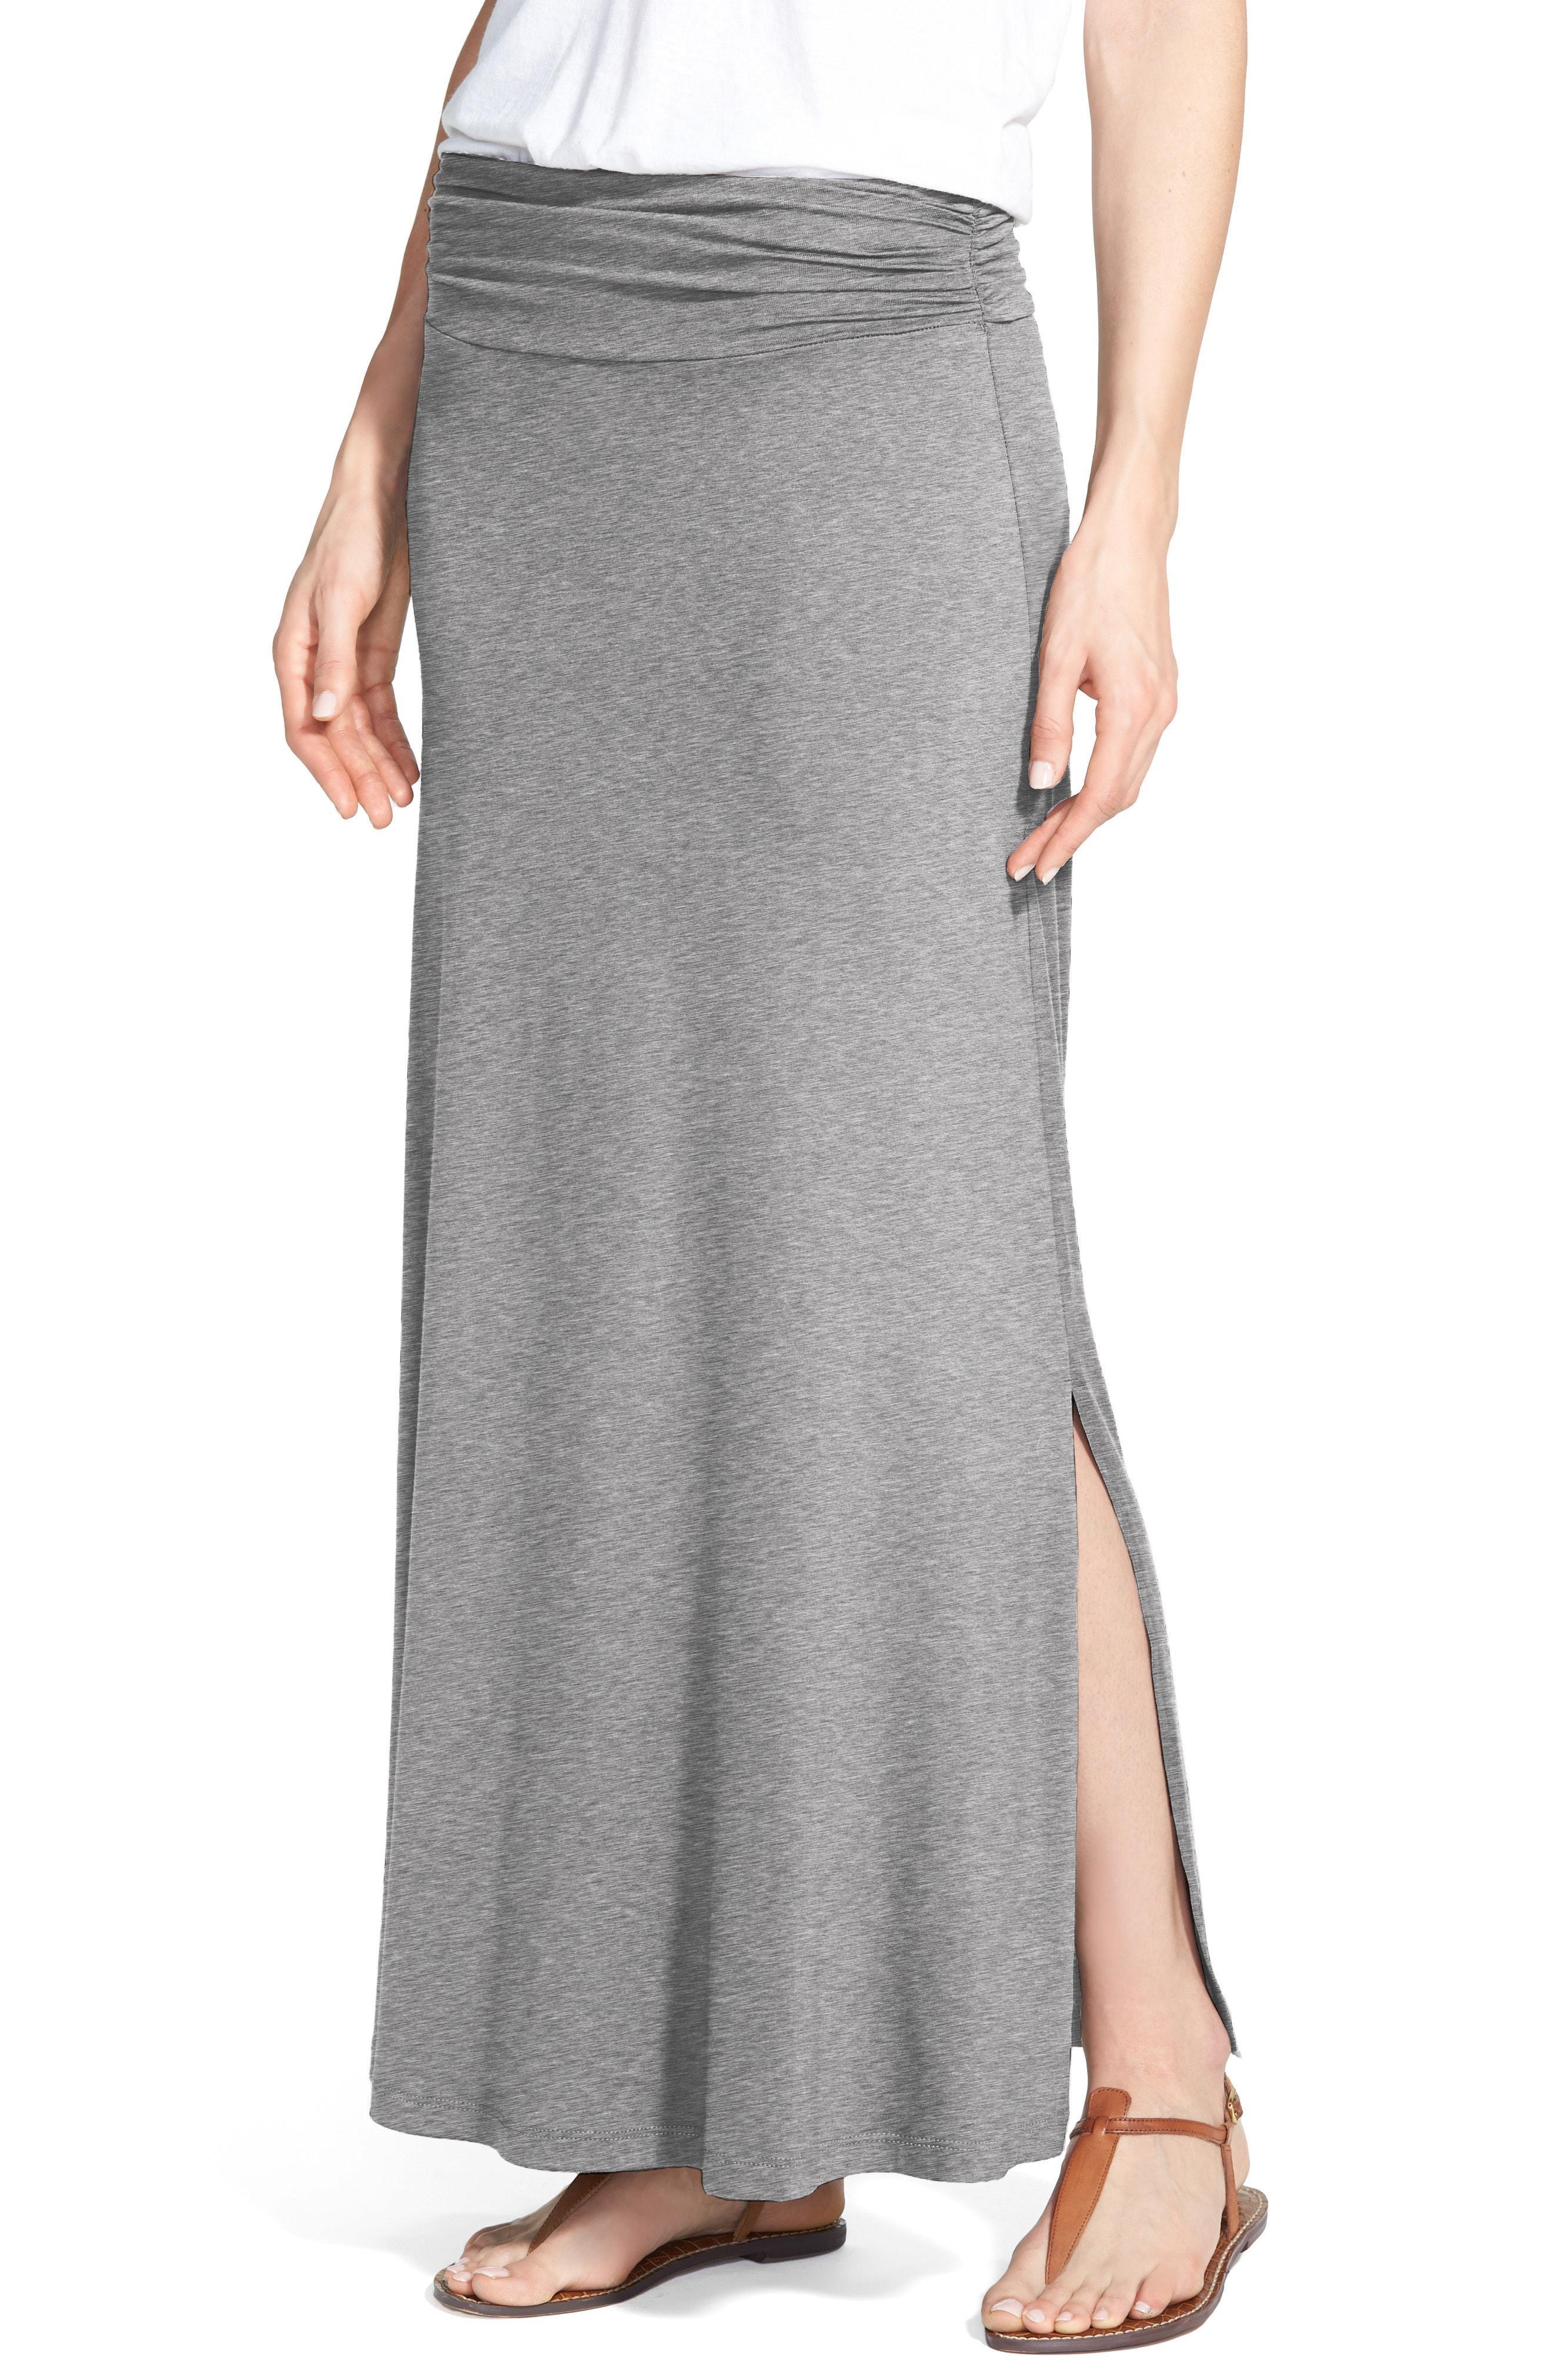 15bd8da972c Lyst - Bobeau Ruched Waist Side Slit Maxi Skirt in Gray - Save 50%